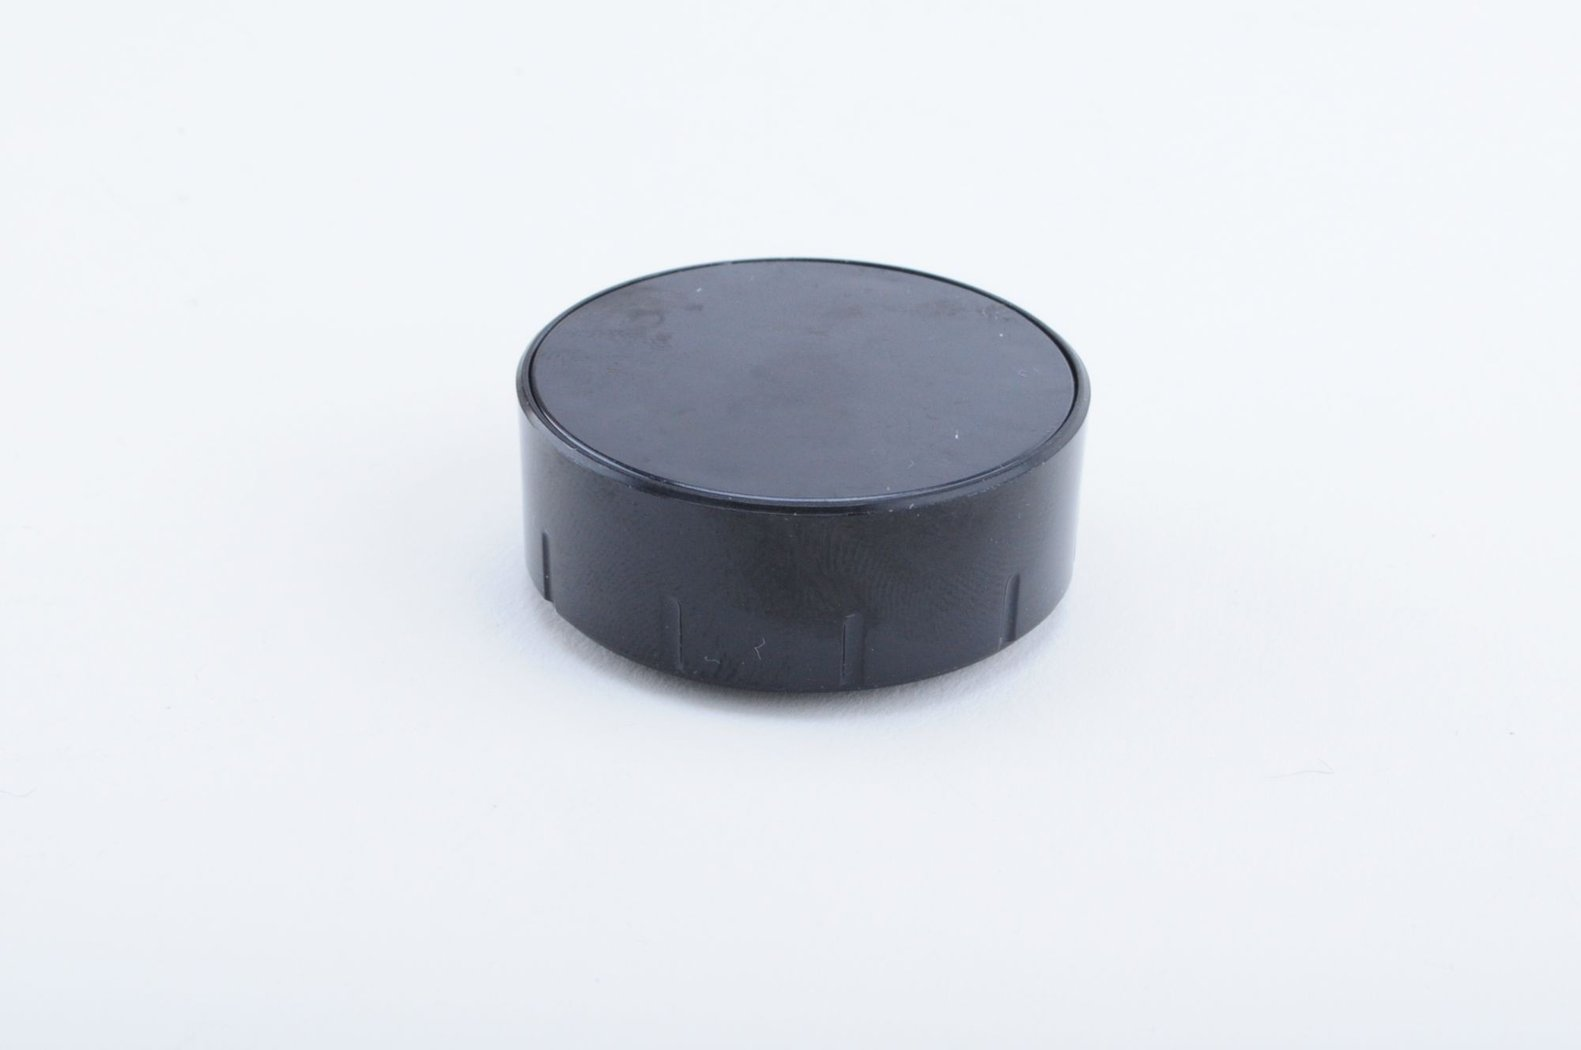 neff twistpad drehgriff magnet schwarz reserve ersatz 00607625. Black Bedroom Furniture Sets. Home Design Ideas